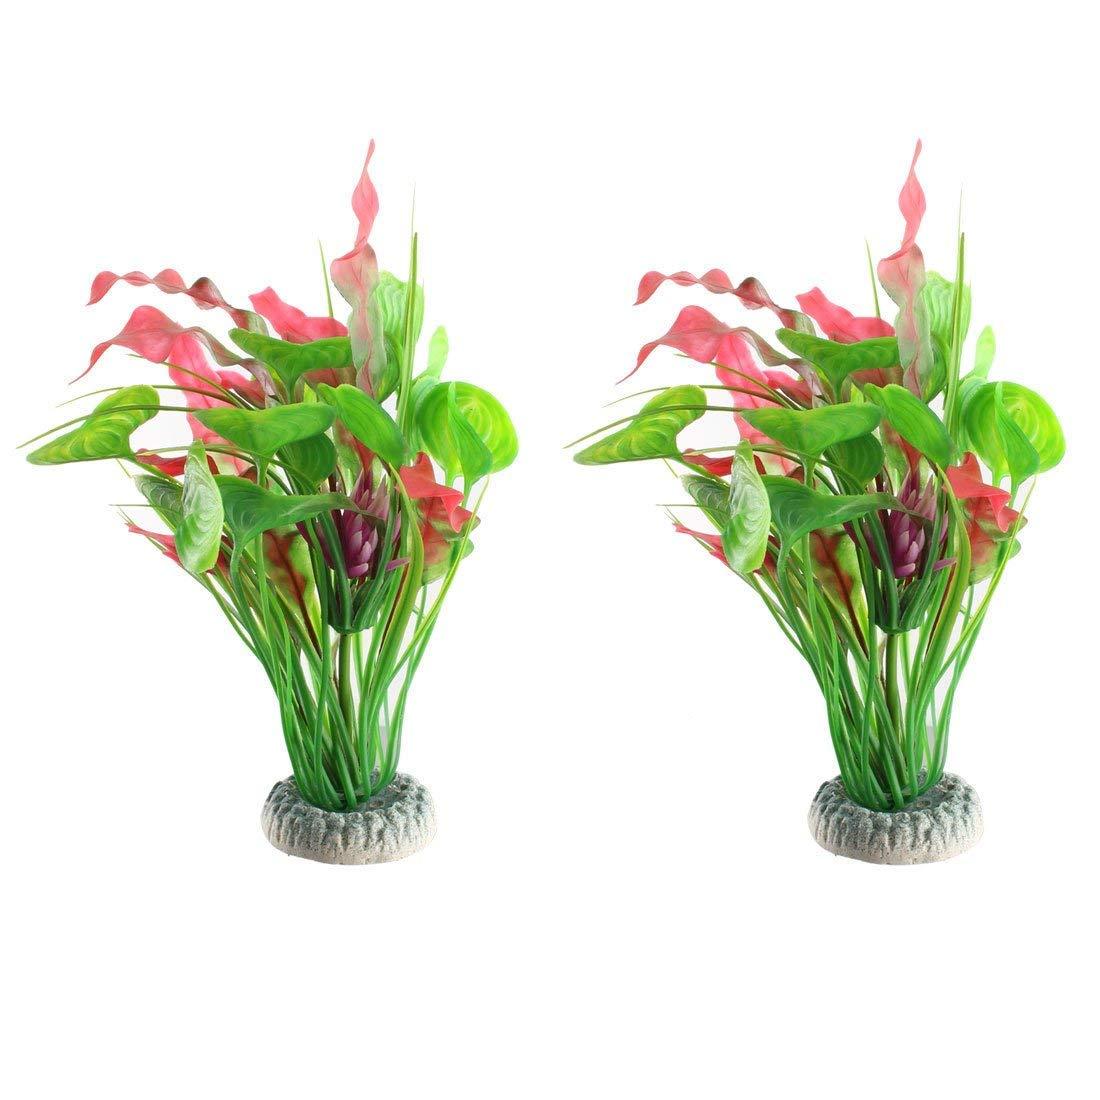 1Pc Ceramic Base Plastic Aquarium Emulational Water Grass Plant Ornament Green Purple